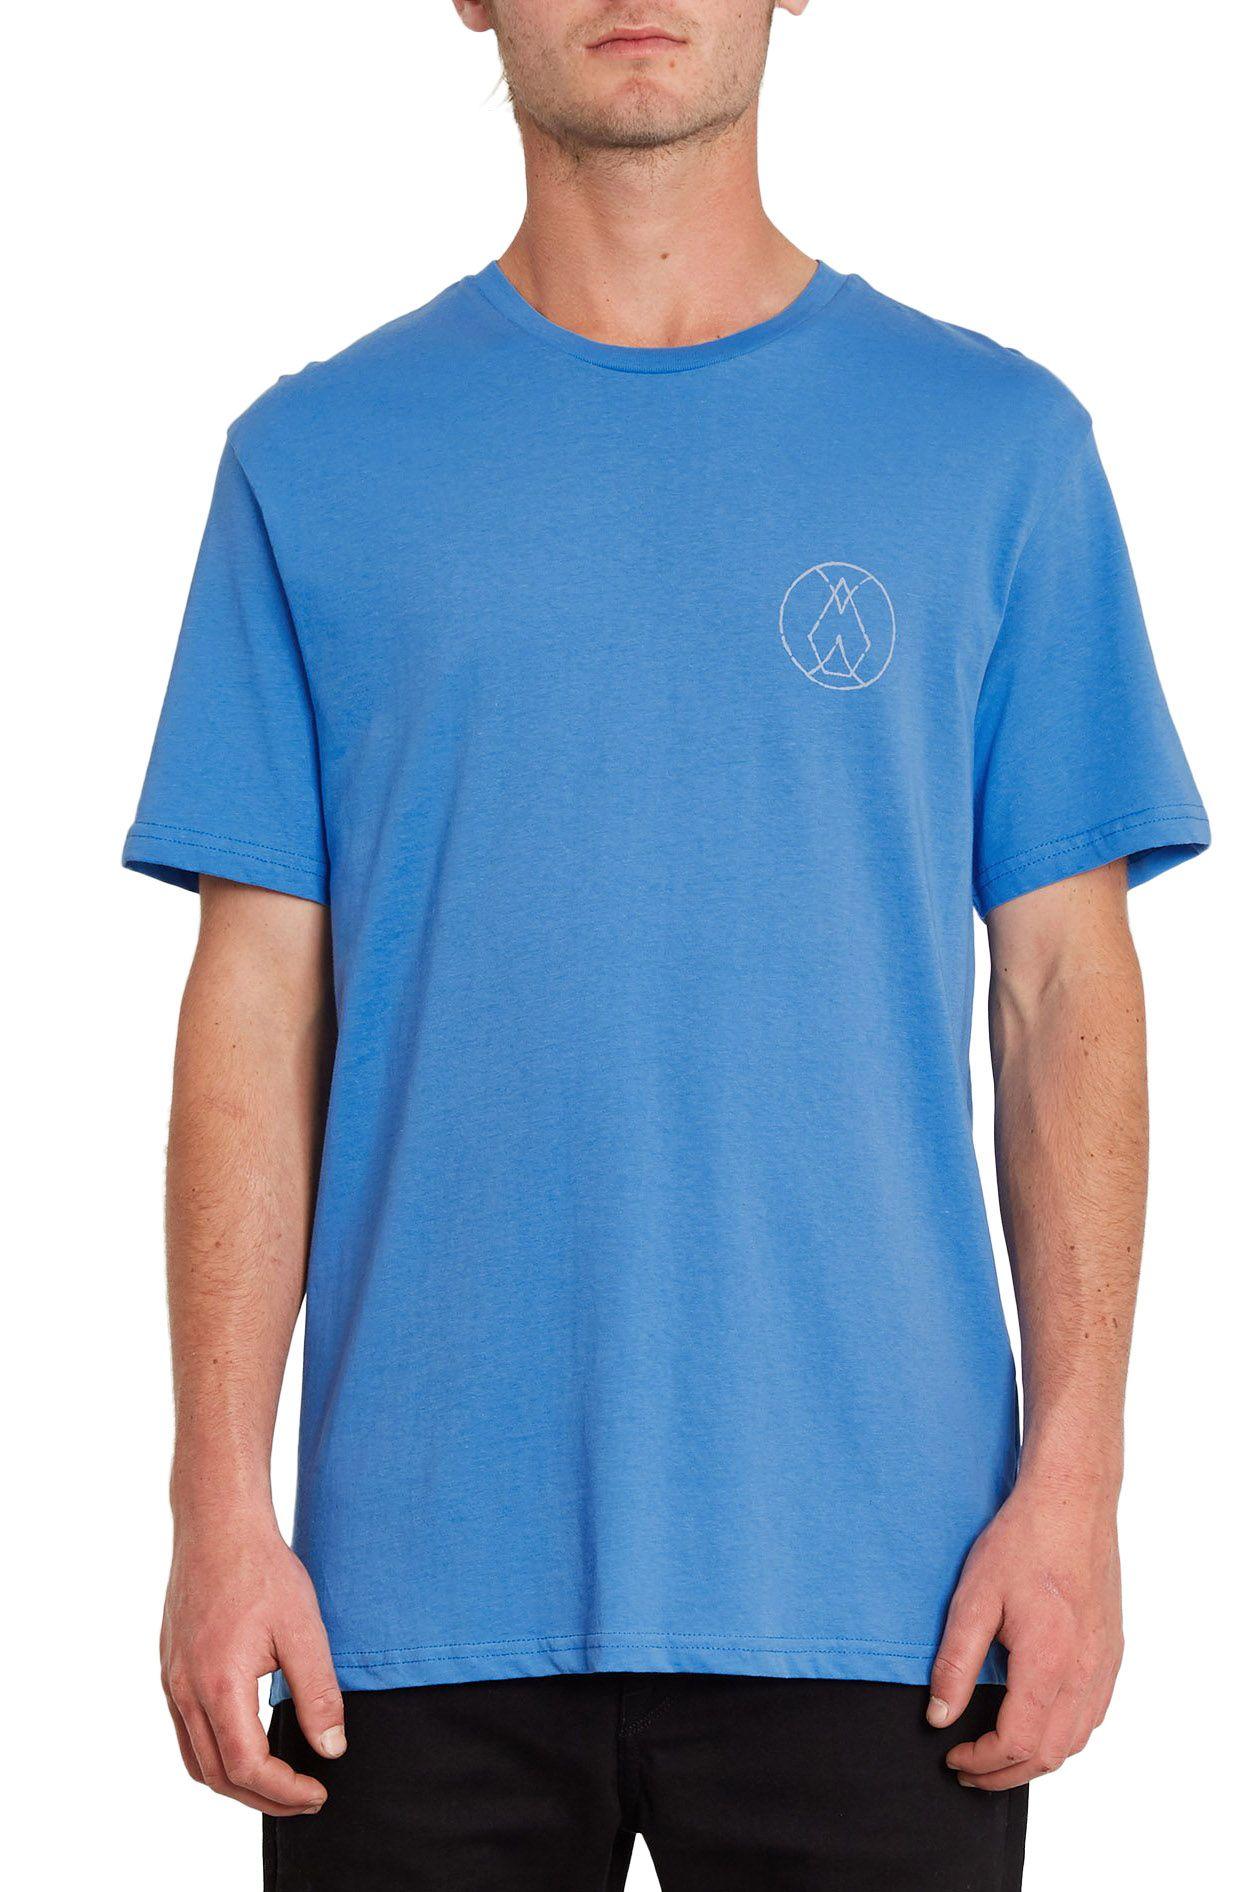 T-Shirt Volcom INNER STONE BSC SS Ballpoint Blue